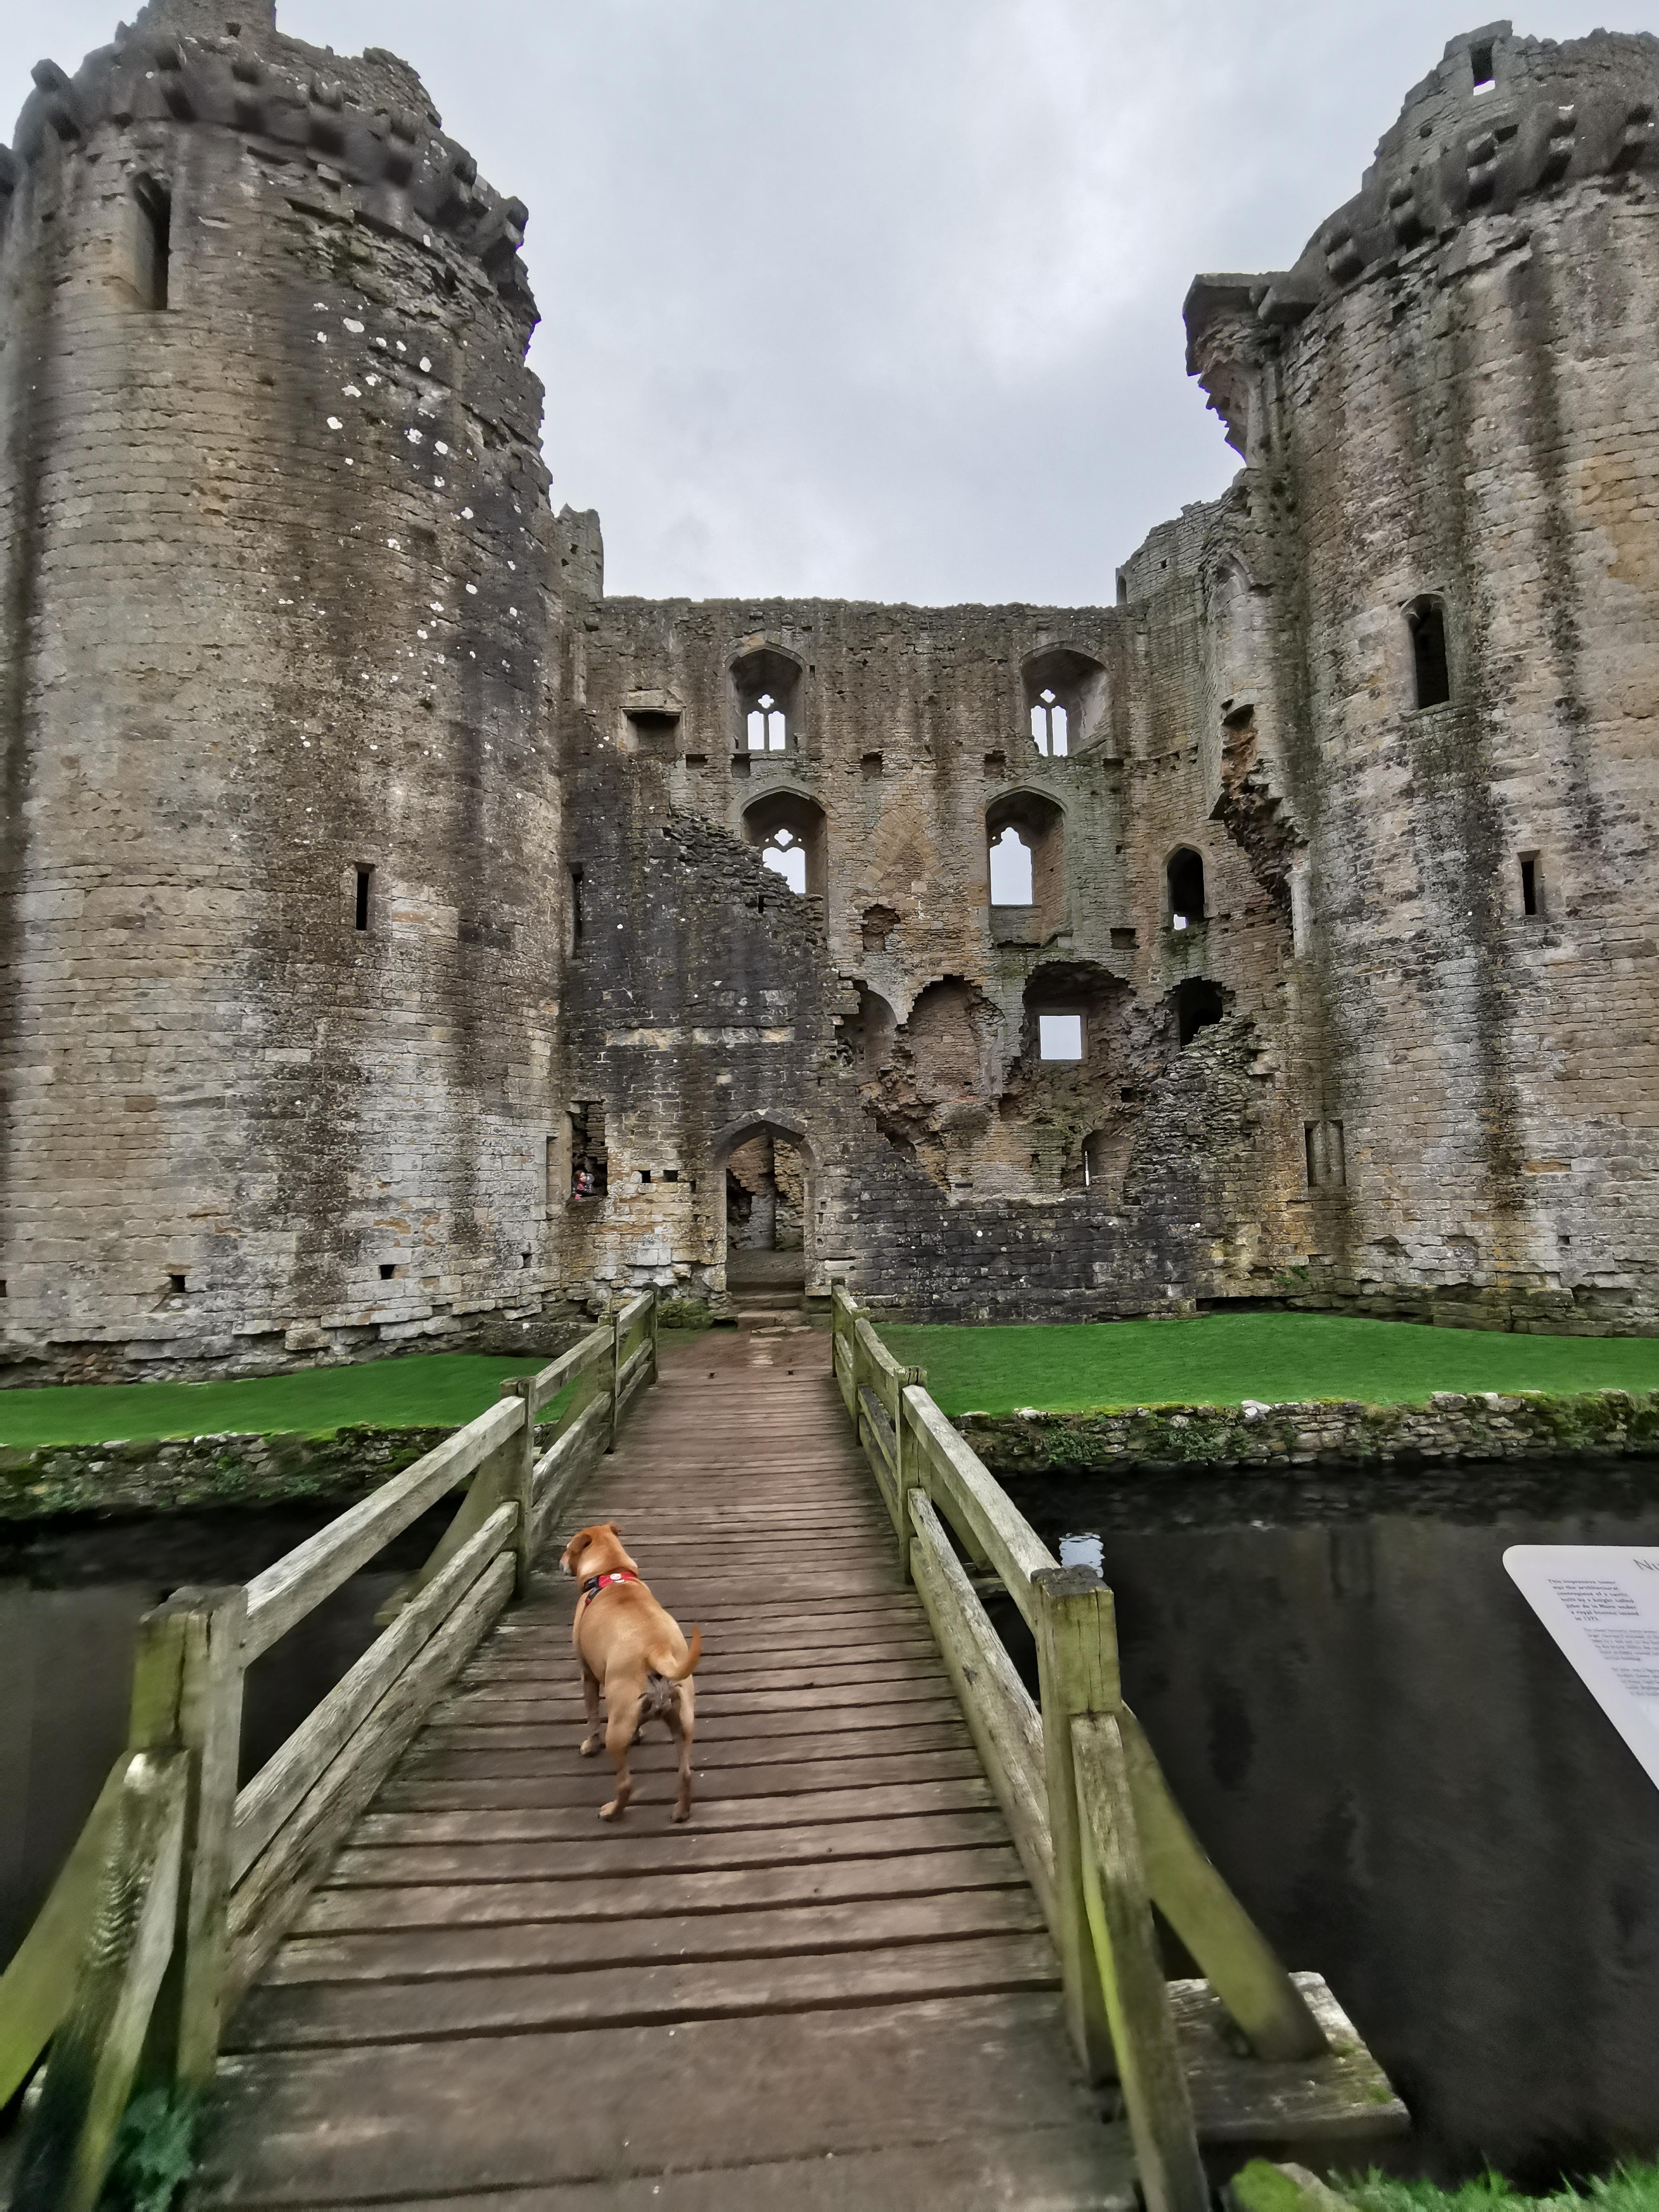 Dog-friendly Nunney Castle